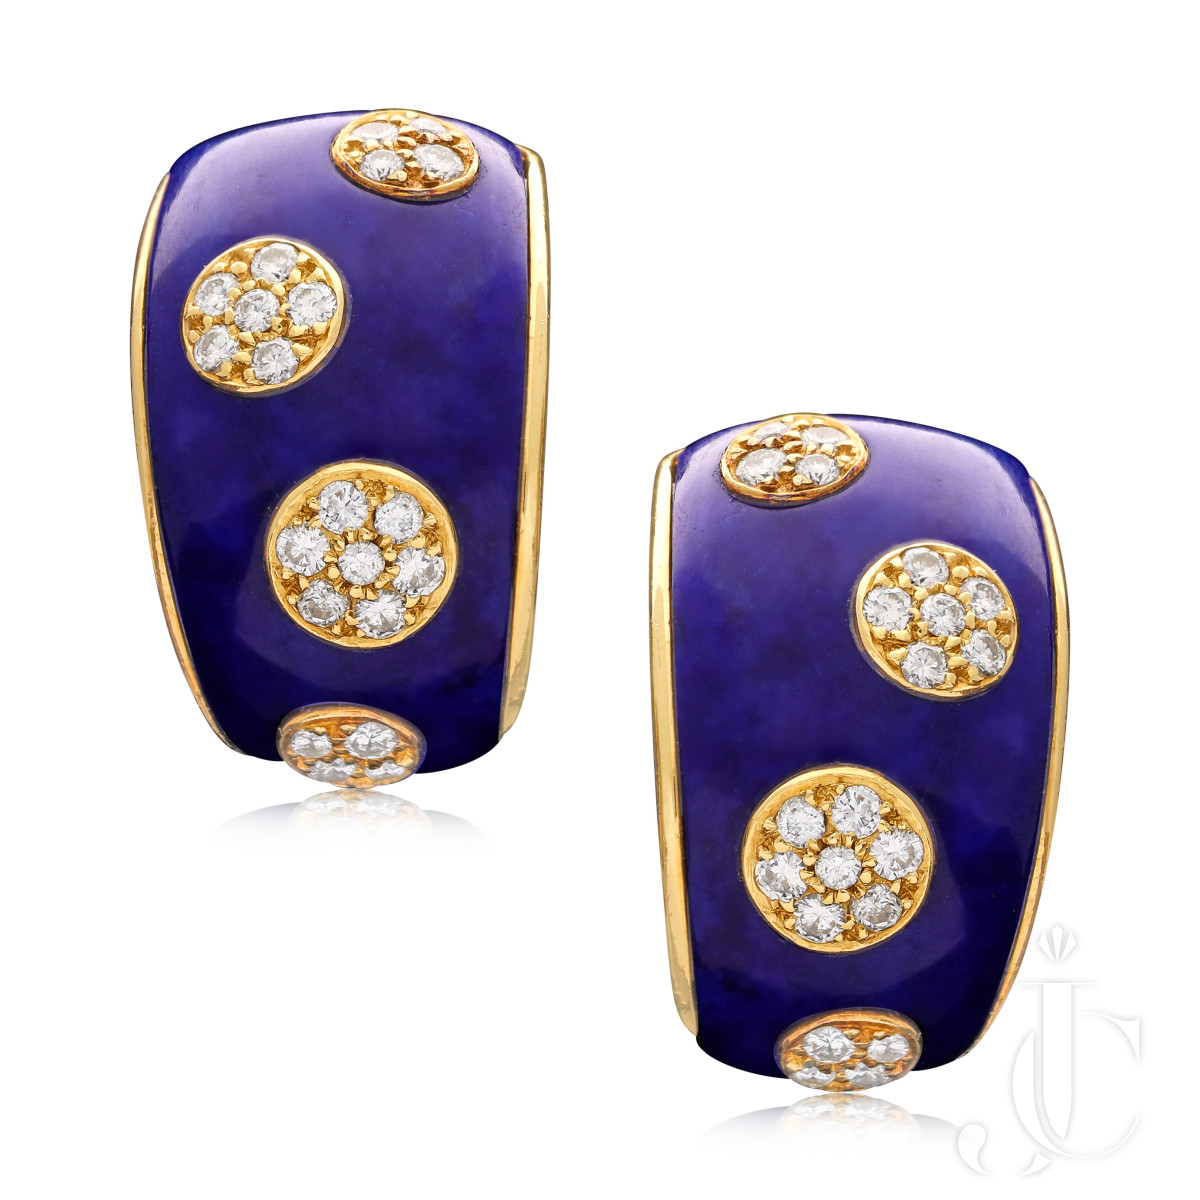 Van Cleef & Arpels Paris Diamond Lapis Gold Earrings circa 1970/80